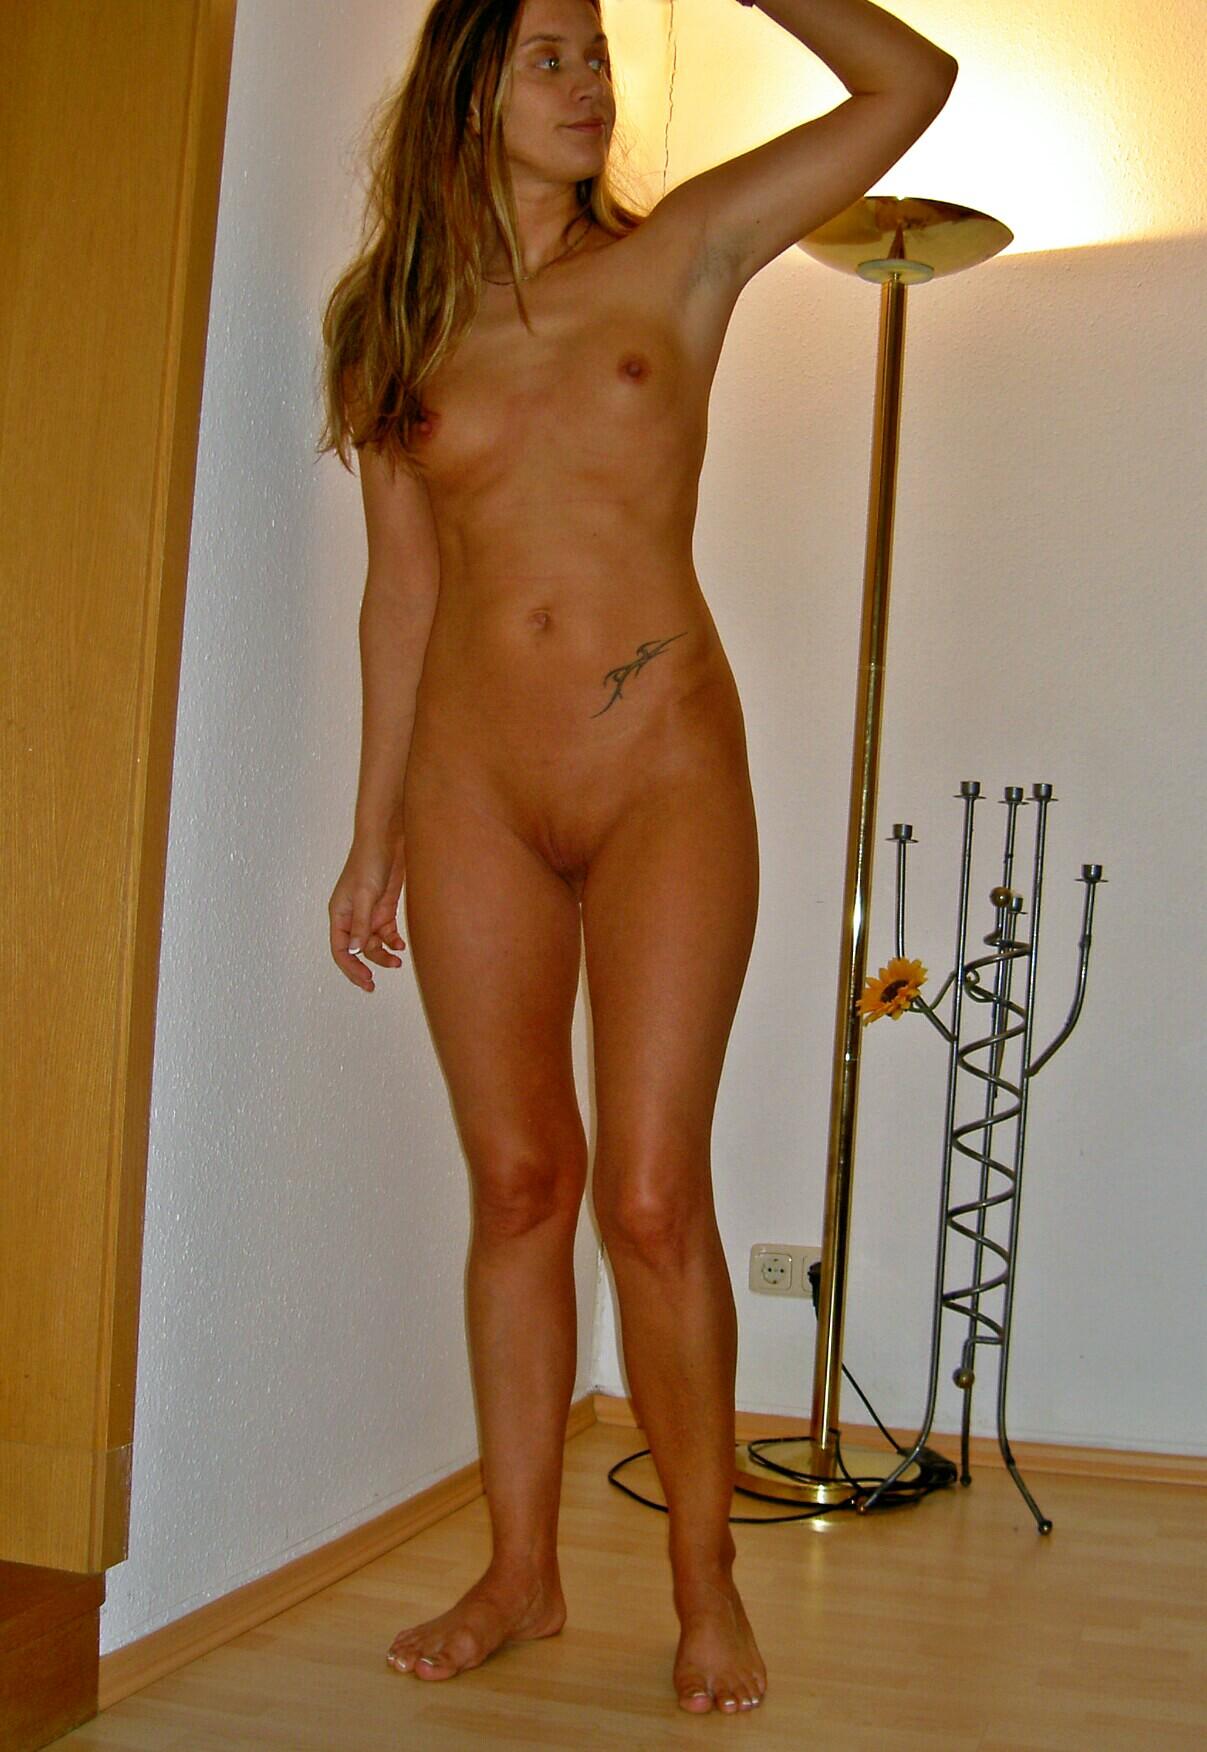 german girl | Regional Nude Women Photos - Only Local ...